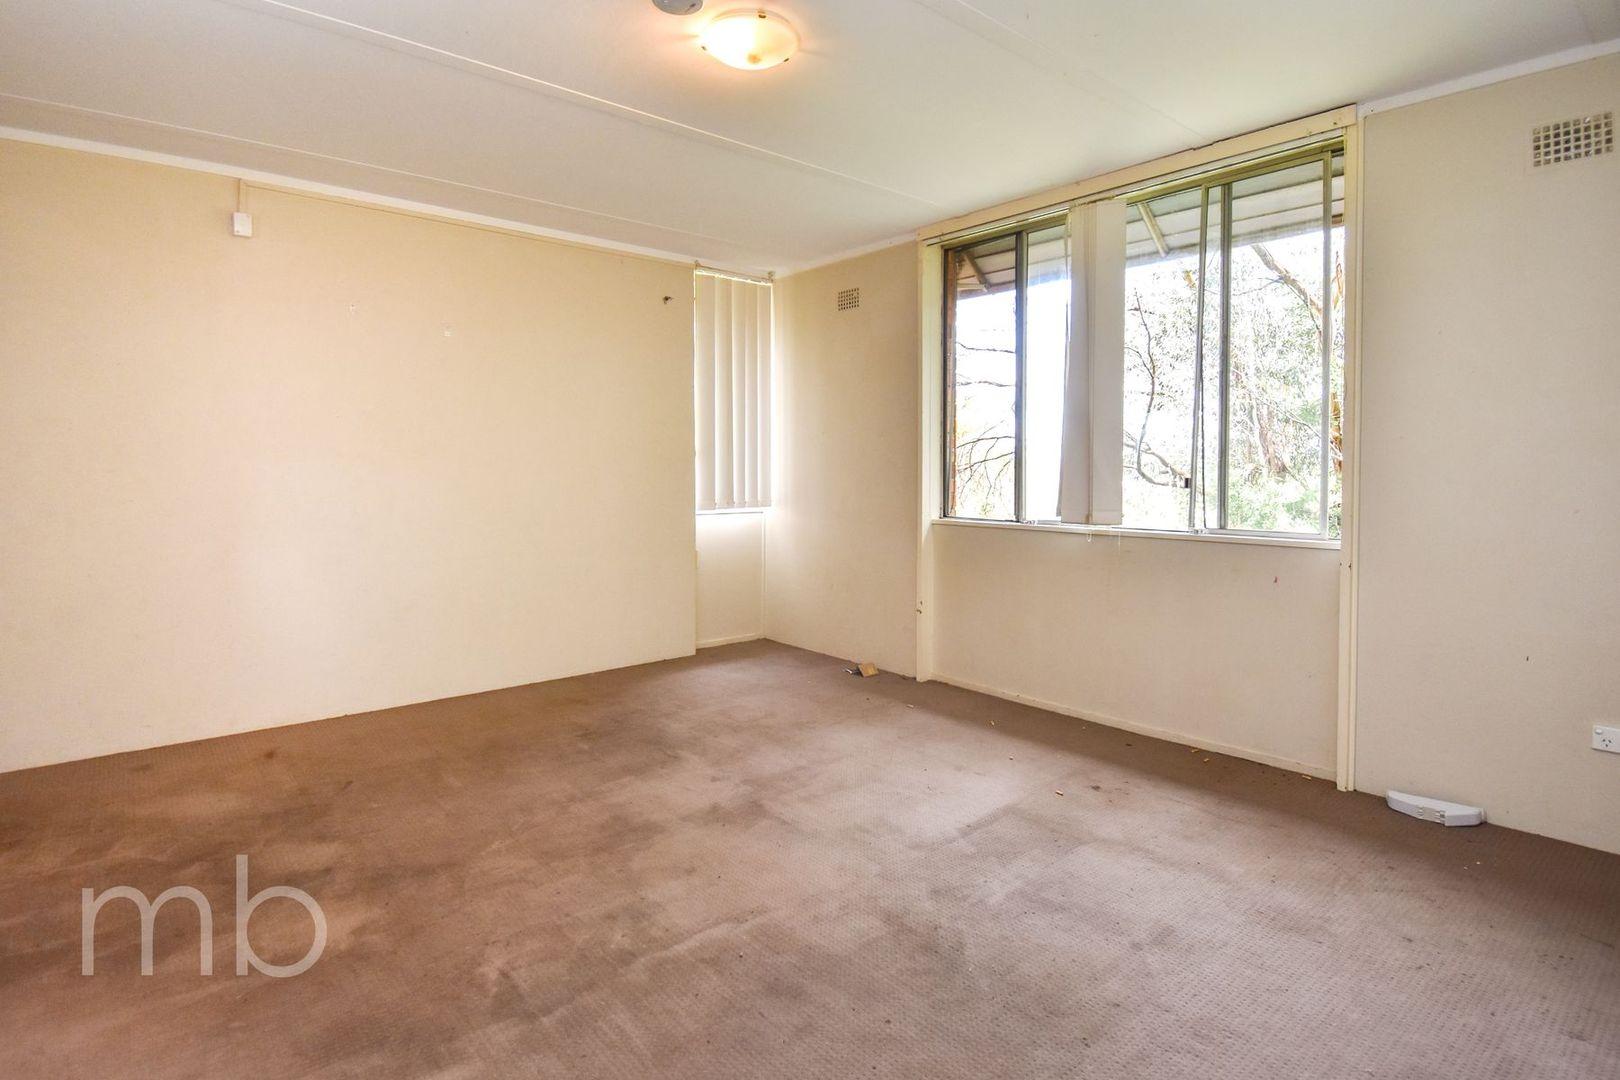 22/124 Margaret Street, Orange NSW 2800, Image 1